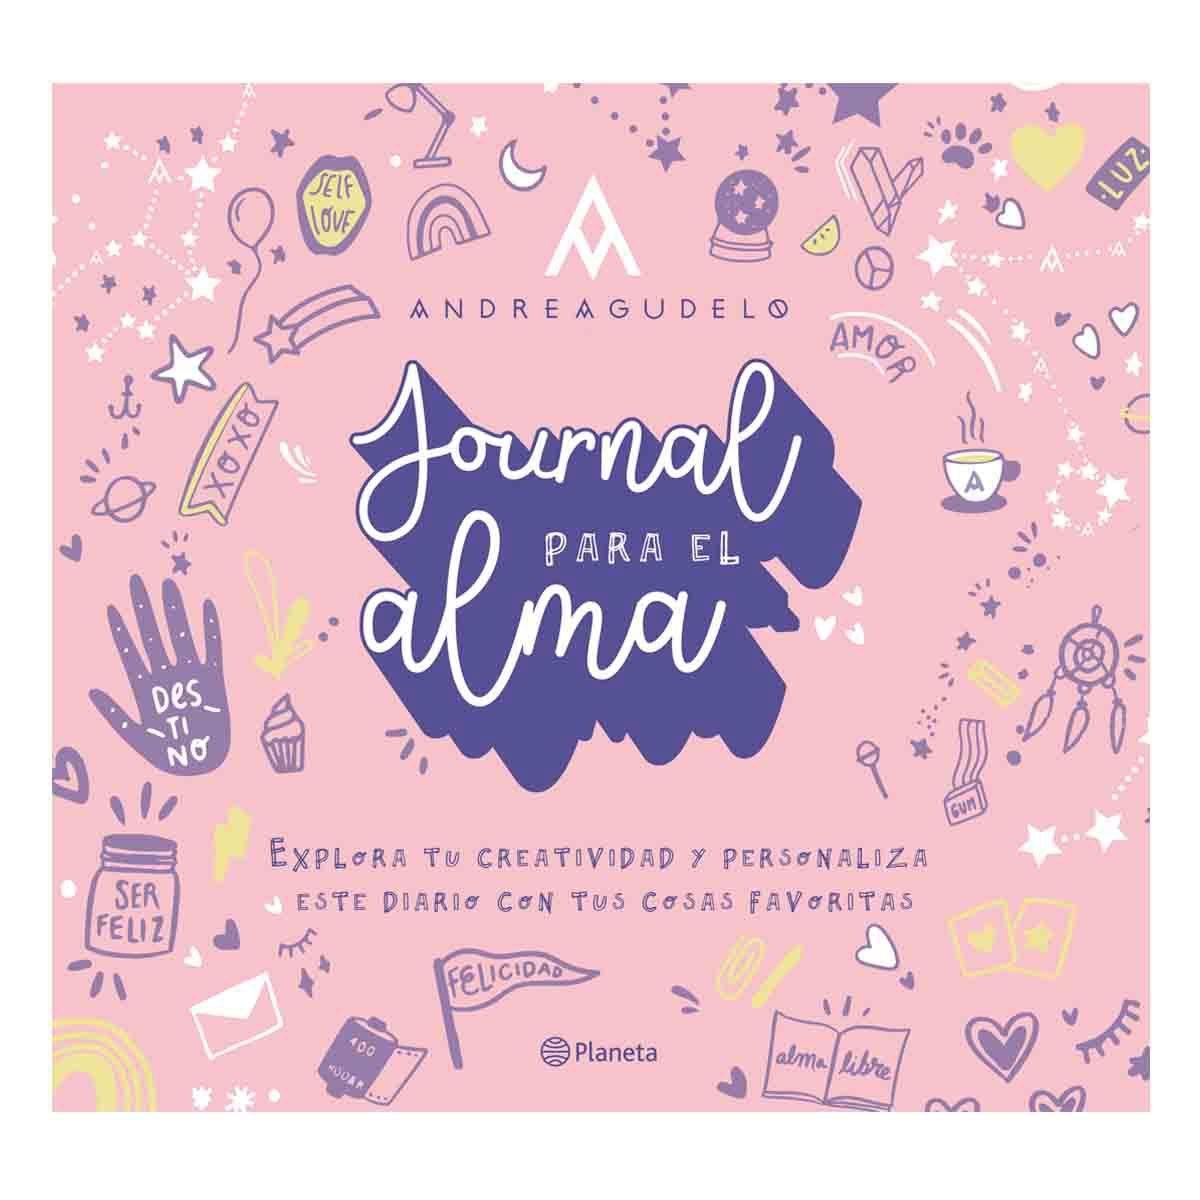 Journal para el alma